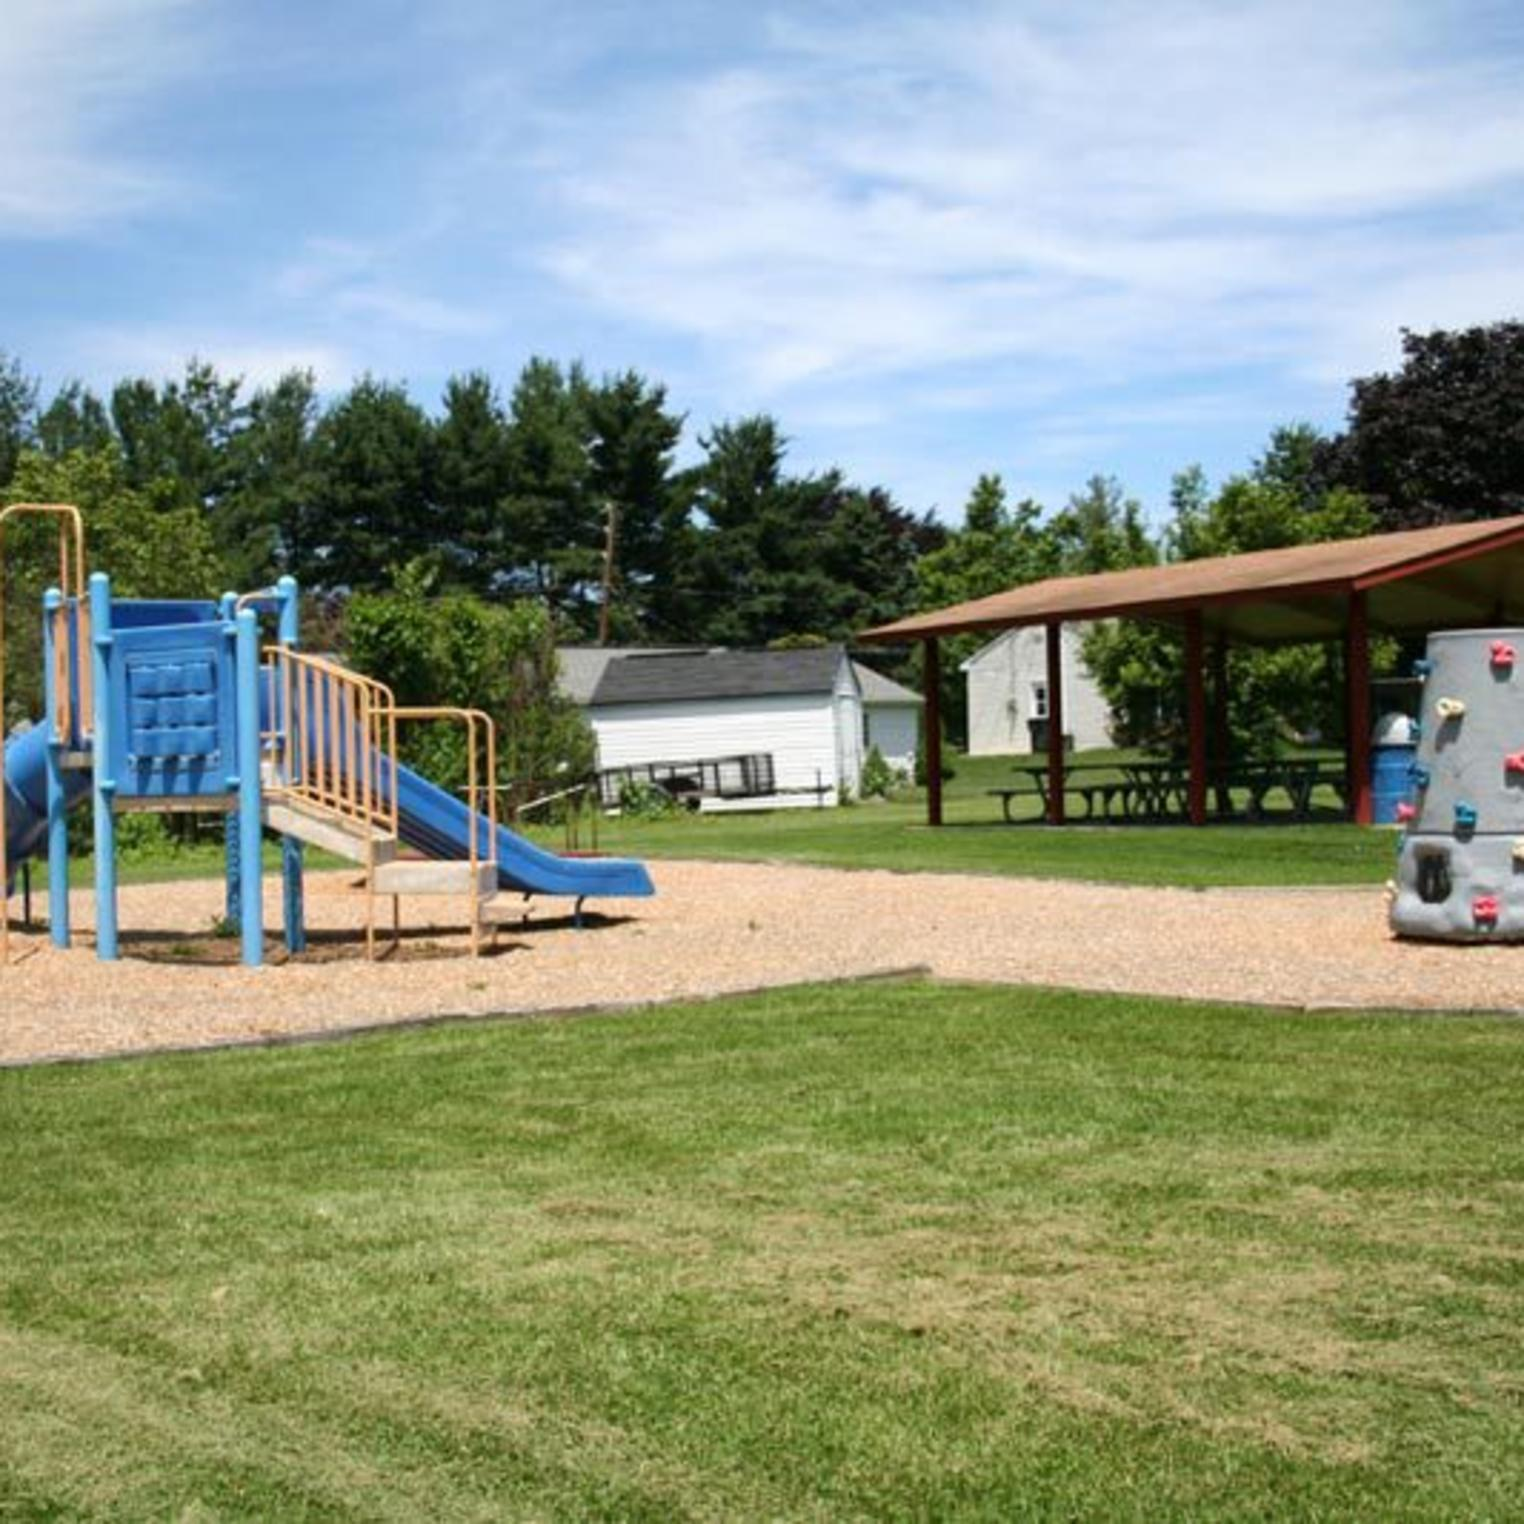 Center Square Park Playground